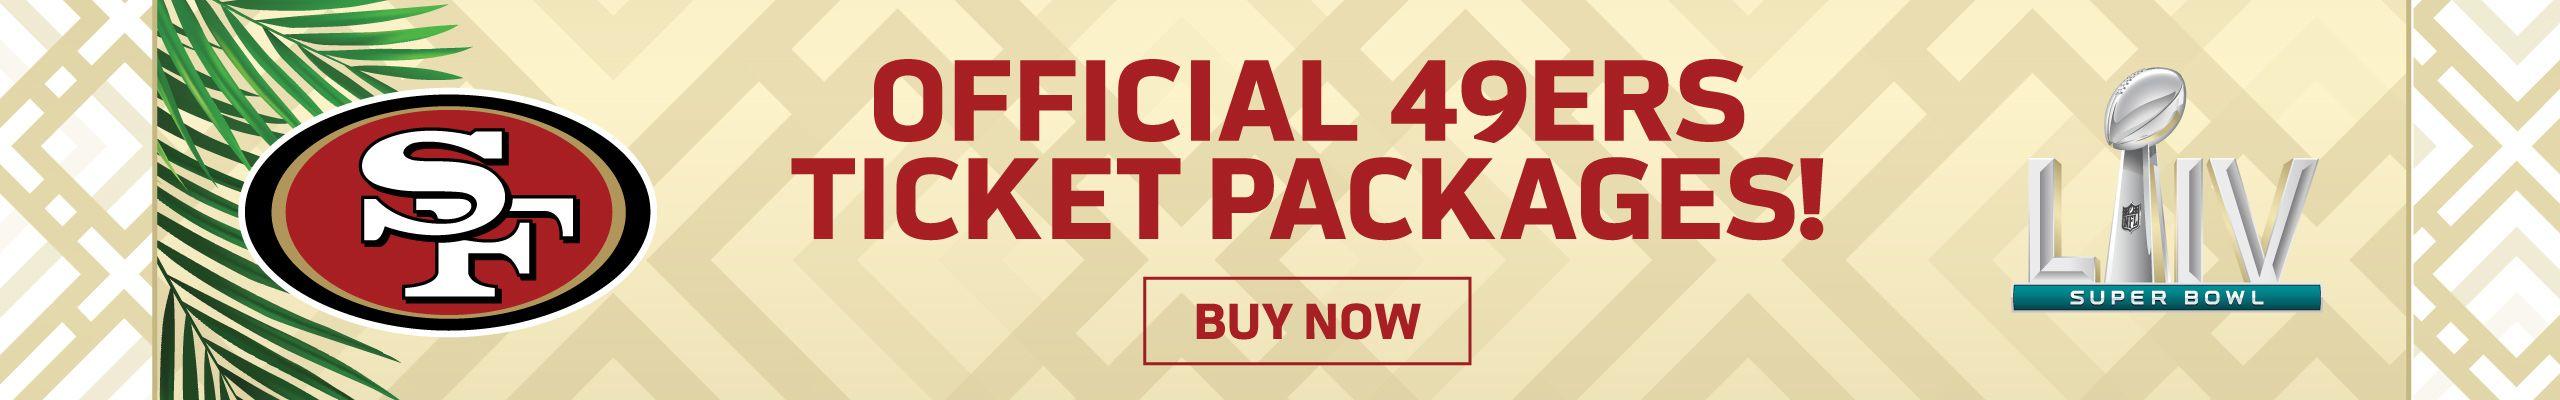 SB54-49ers-leaderboard